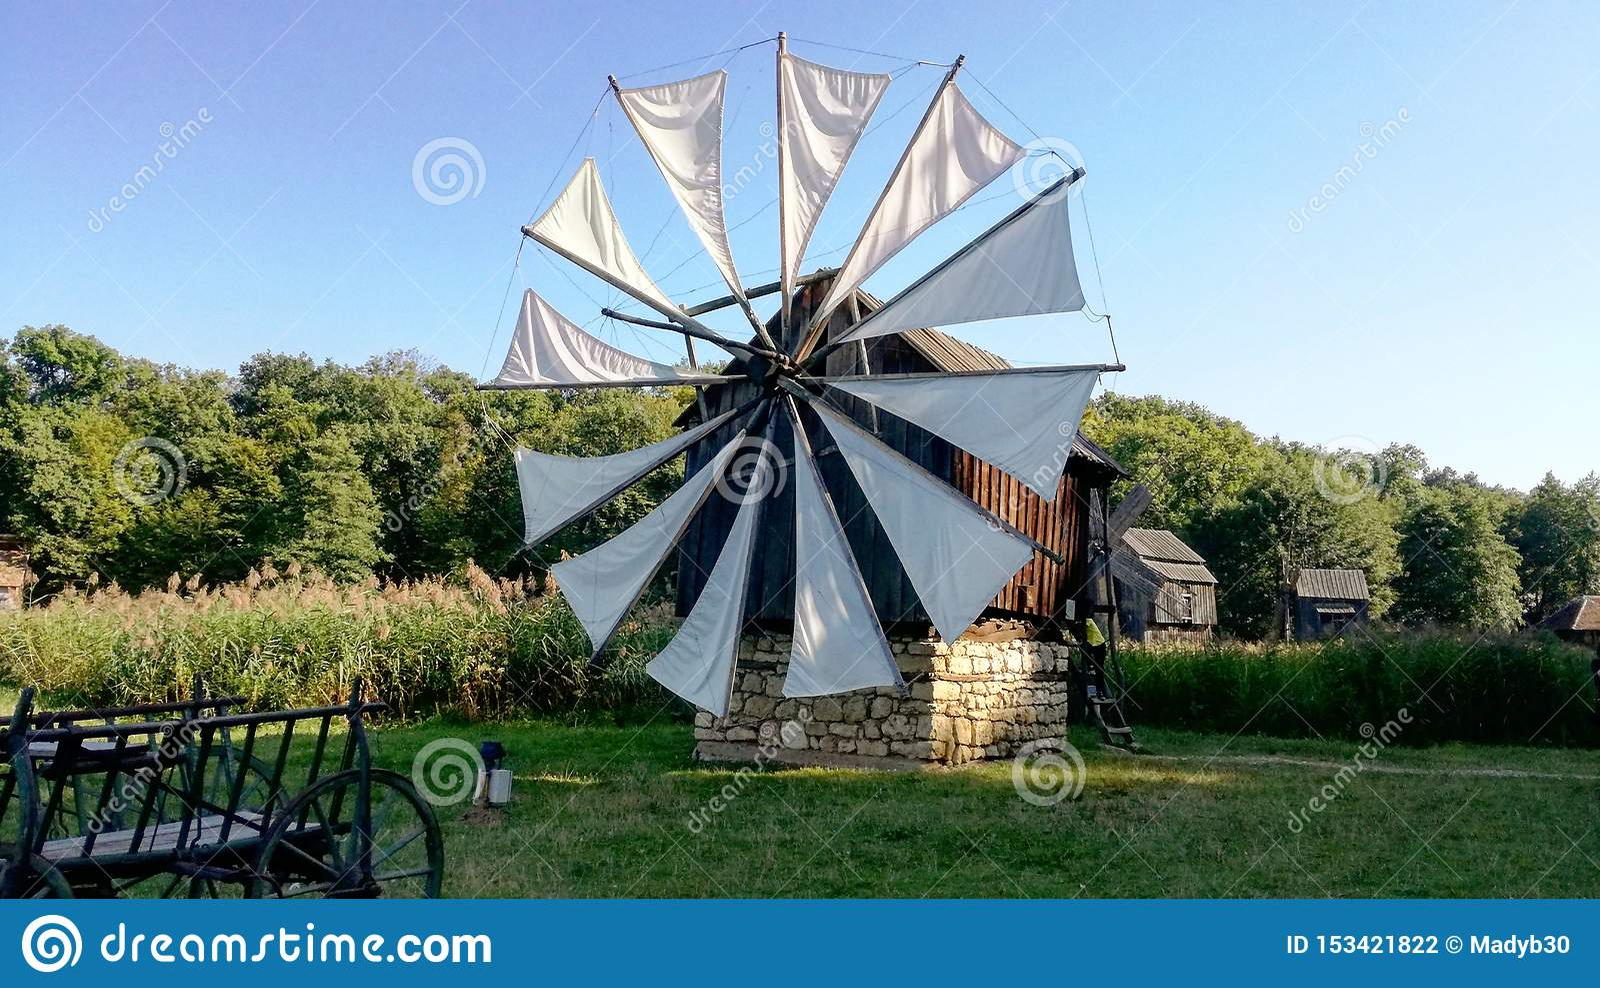 Windmill in a bath of sun